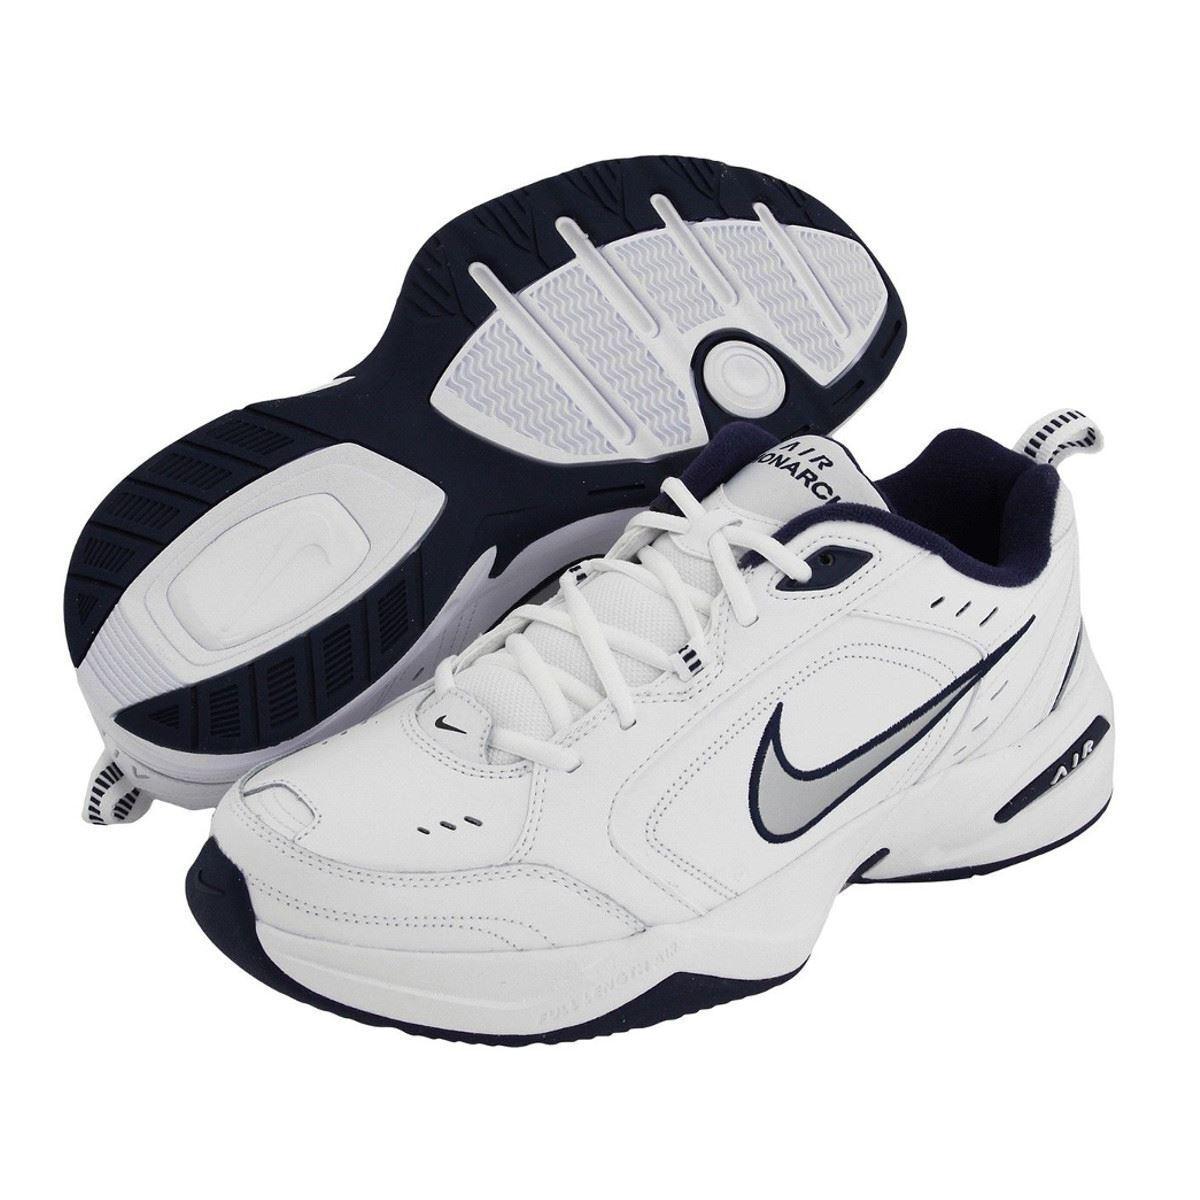 Nike AIR MONARCH IV Mens Weiß Silber Navy 102 Lace Up Running Training schuhe